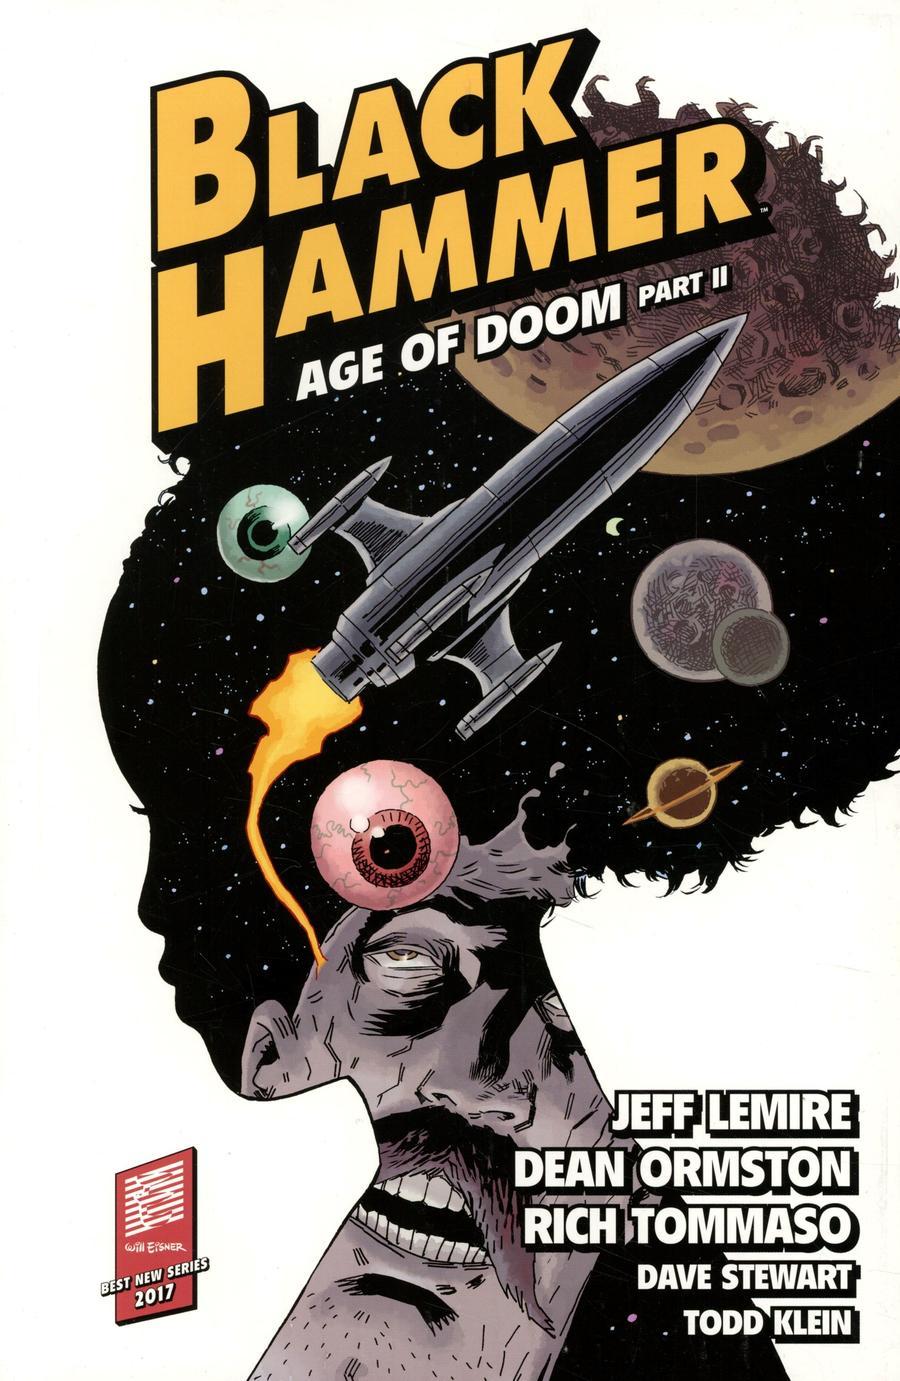 Black Hammer Vol 4 Age Of Doom Part 2 TP